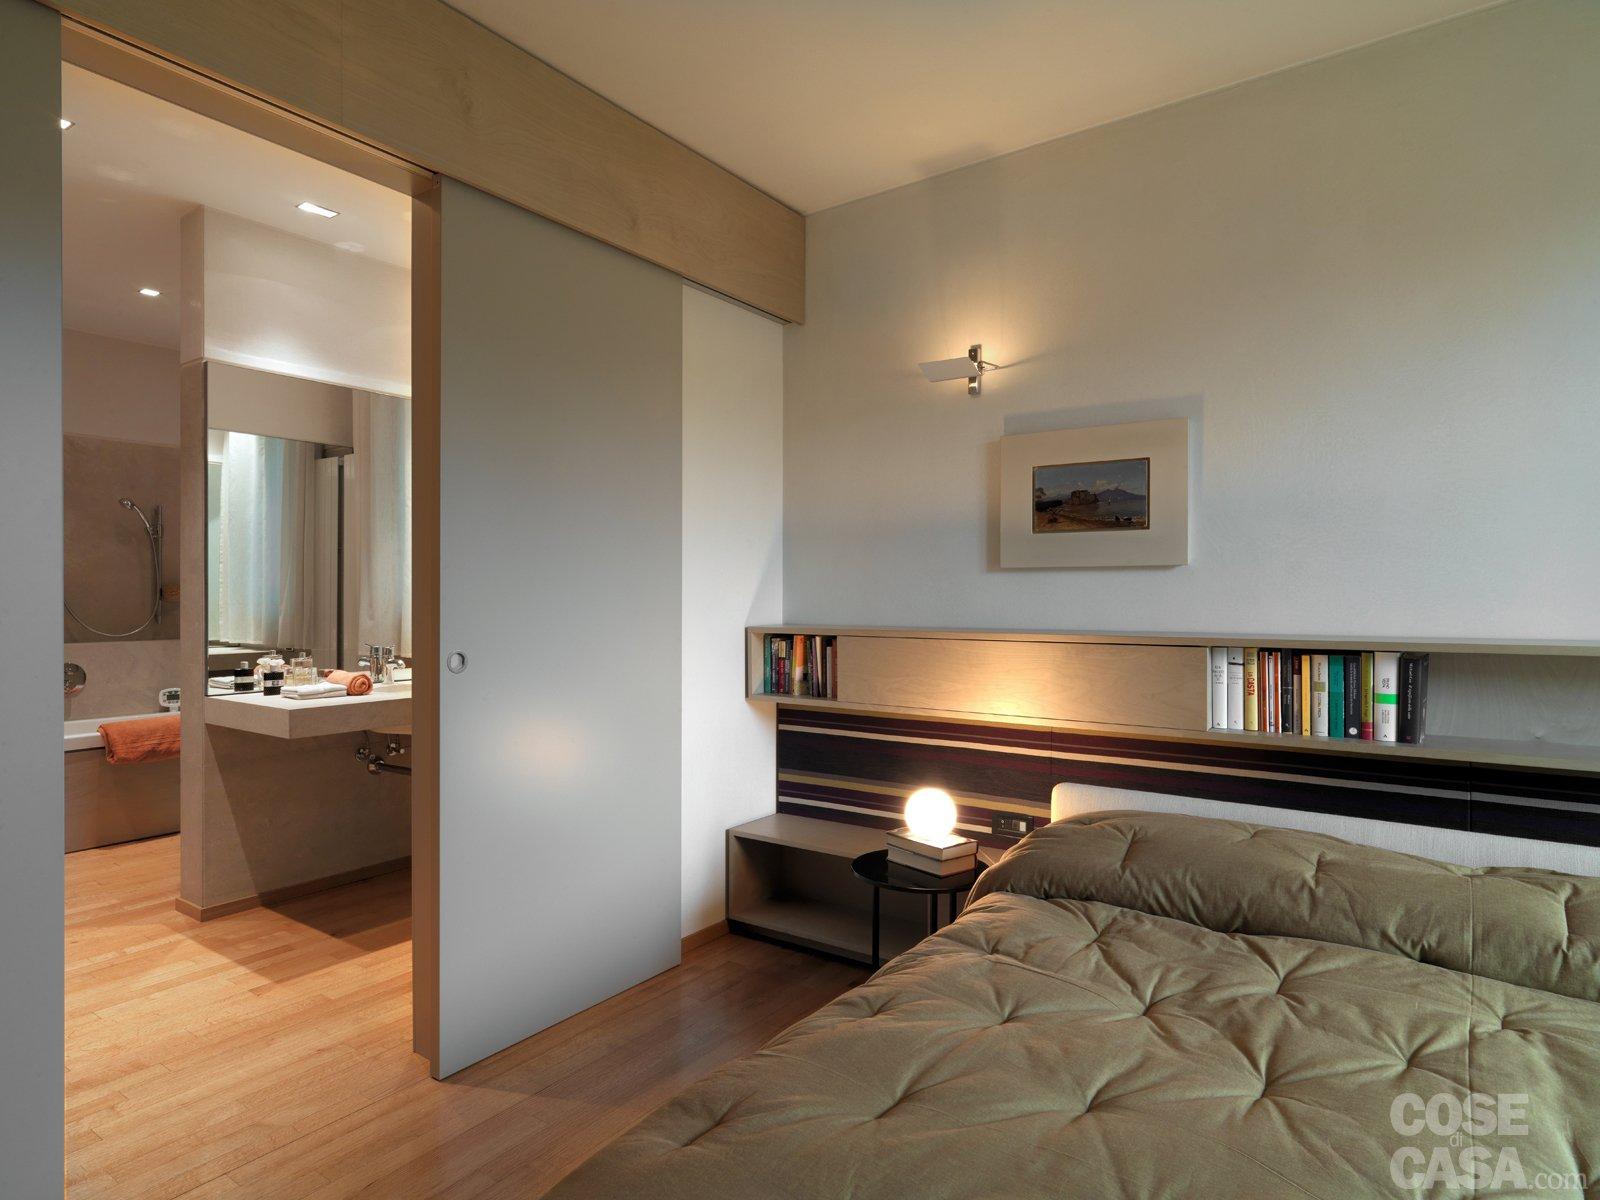 Una casa arredata con pezzi di design e finiture di - Pezzi di design ...